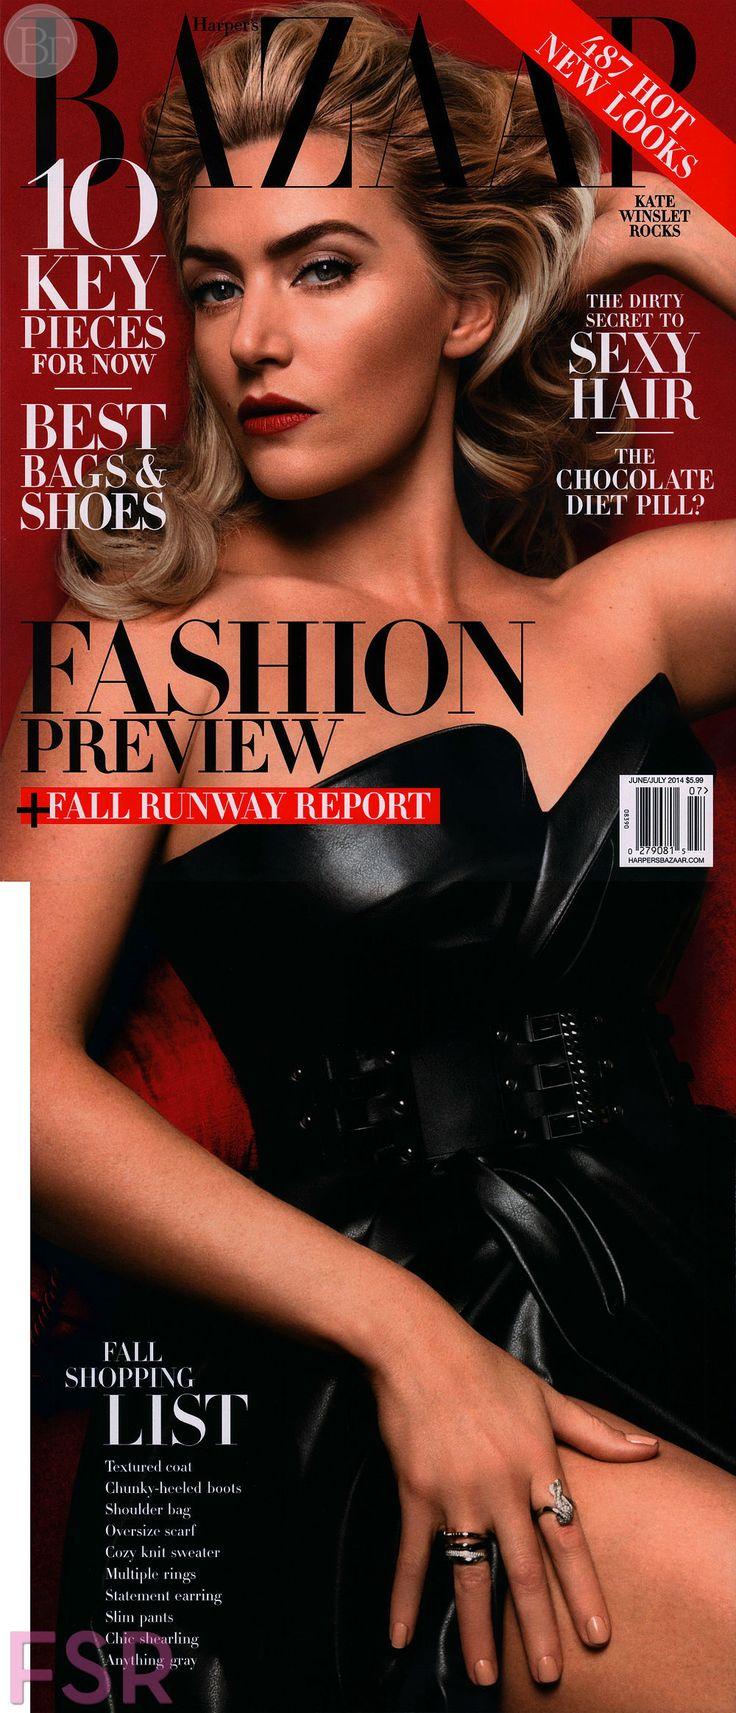 Кейт Уинслет для Harper's Bazaar US, июнь-июль 2014. -    Далее: http://vikagreen.ru/kejt-uinslet-dlya-harpers-bazaar-us-iyun-iyul-2014/